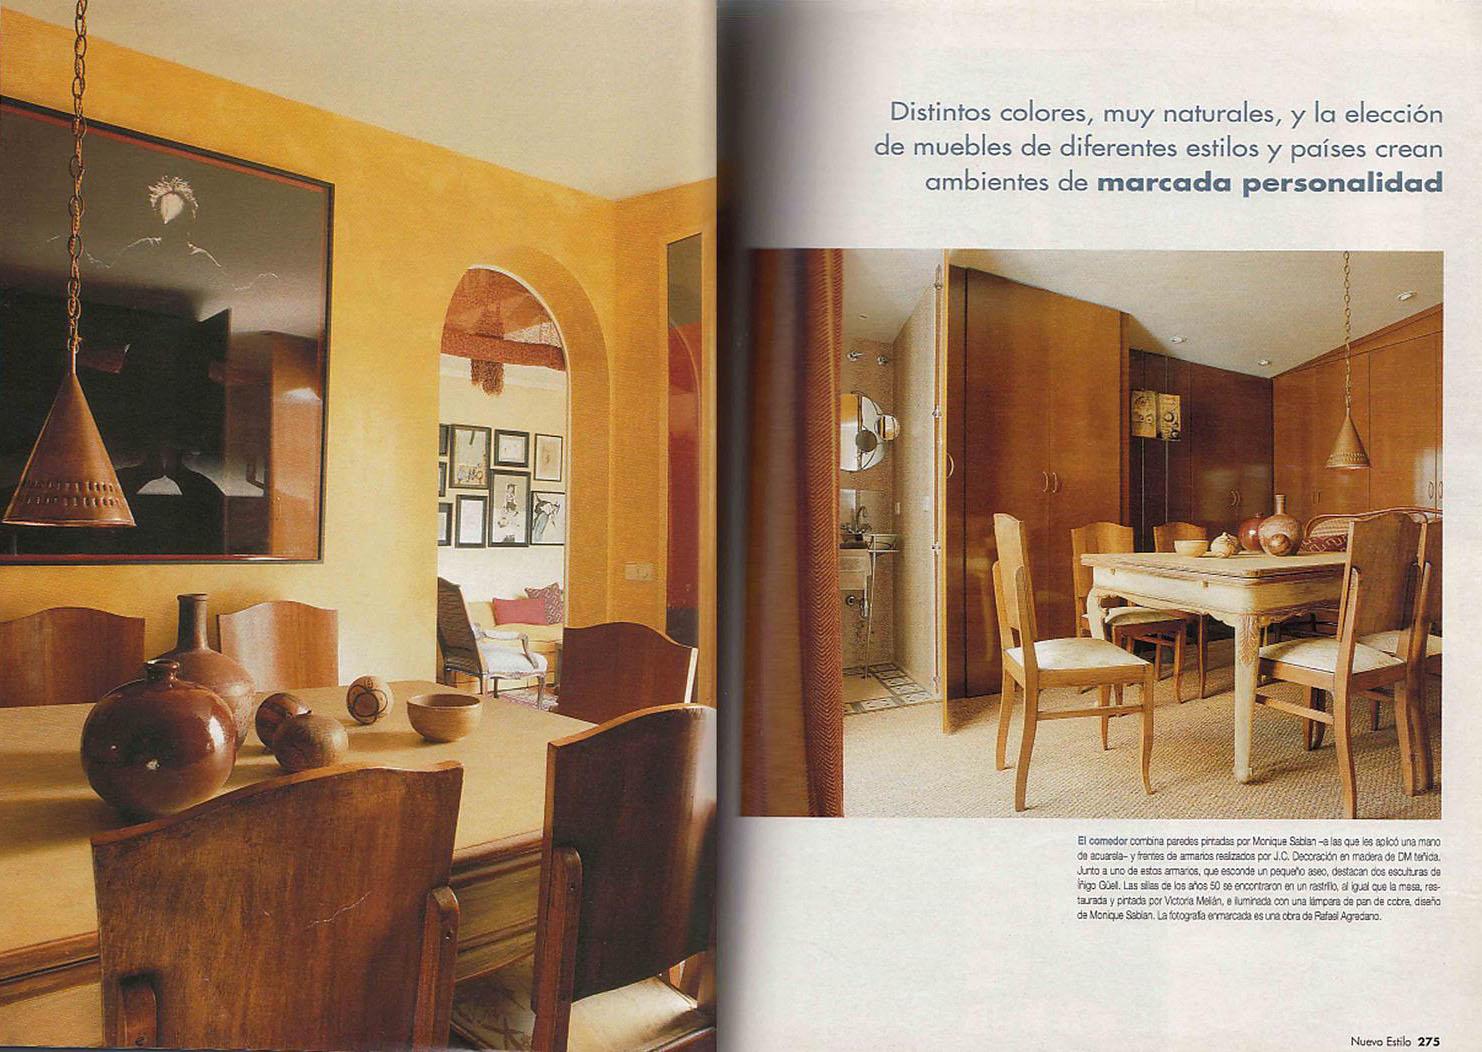 nuevo_estilo-melian_randolph-2000-6